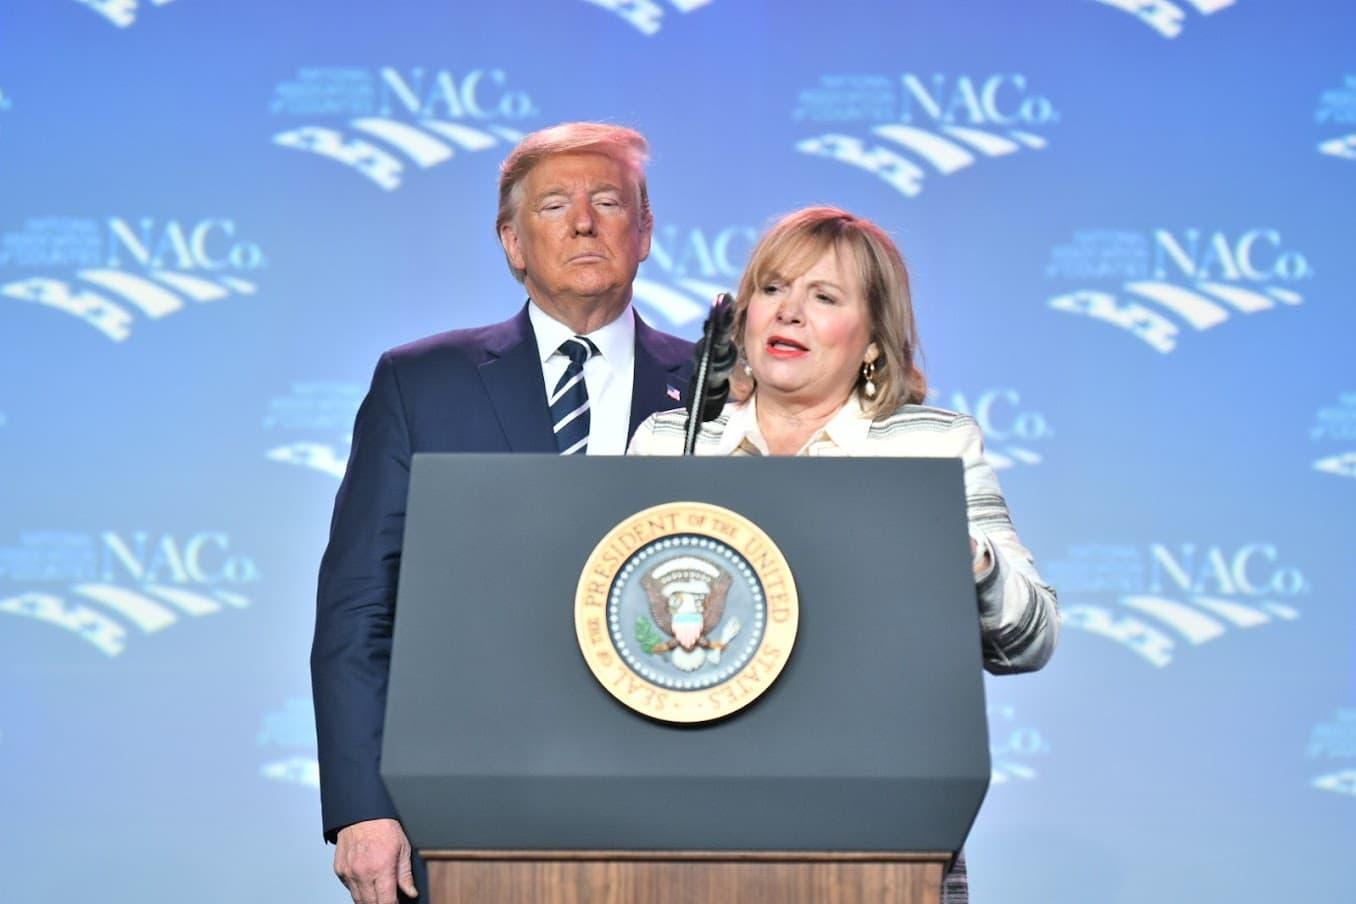 Commissioner-Kathryn-Starkey-and-President-Donald-Trump.jpg